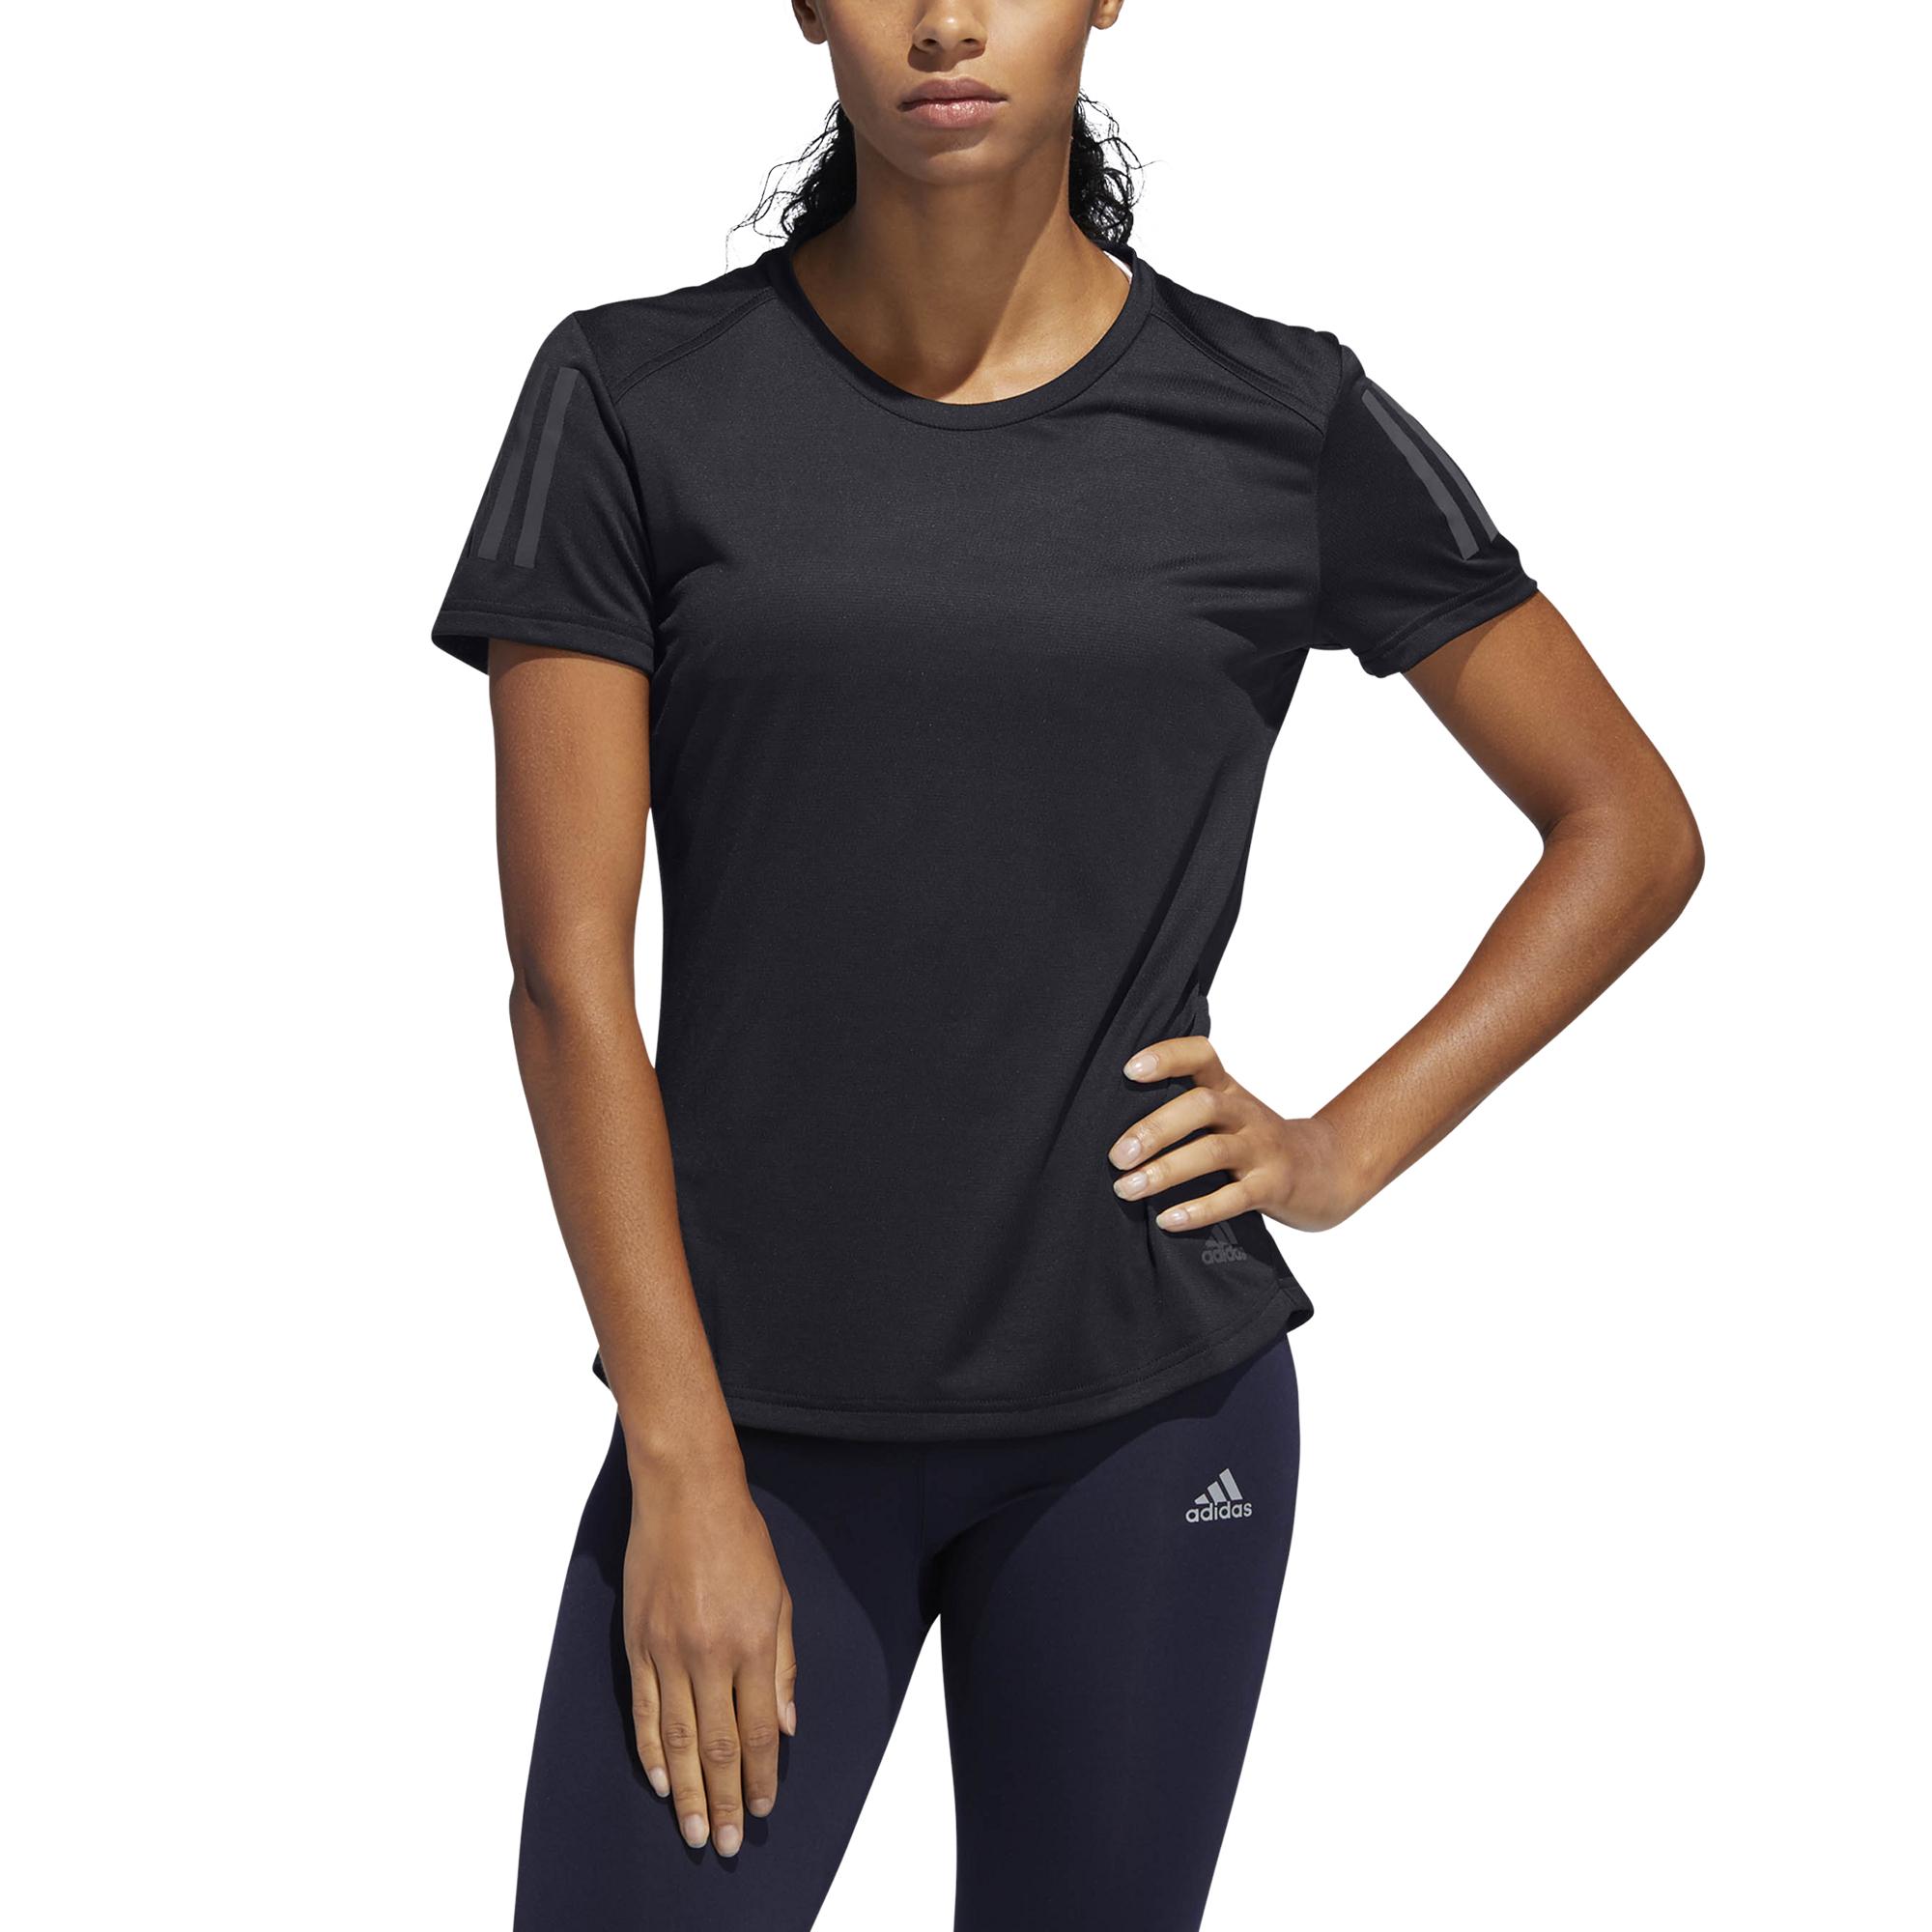 pas mal 8be8b 49cda T-shirt femme adidas Own the Run